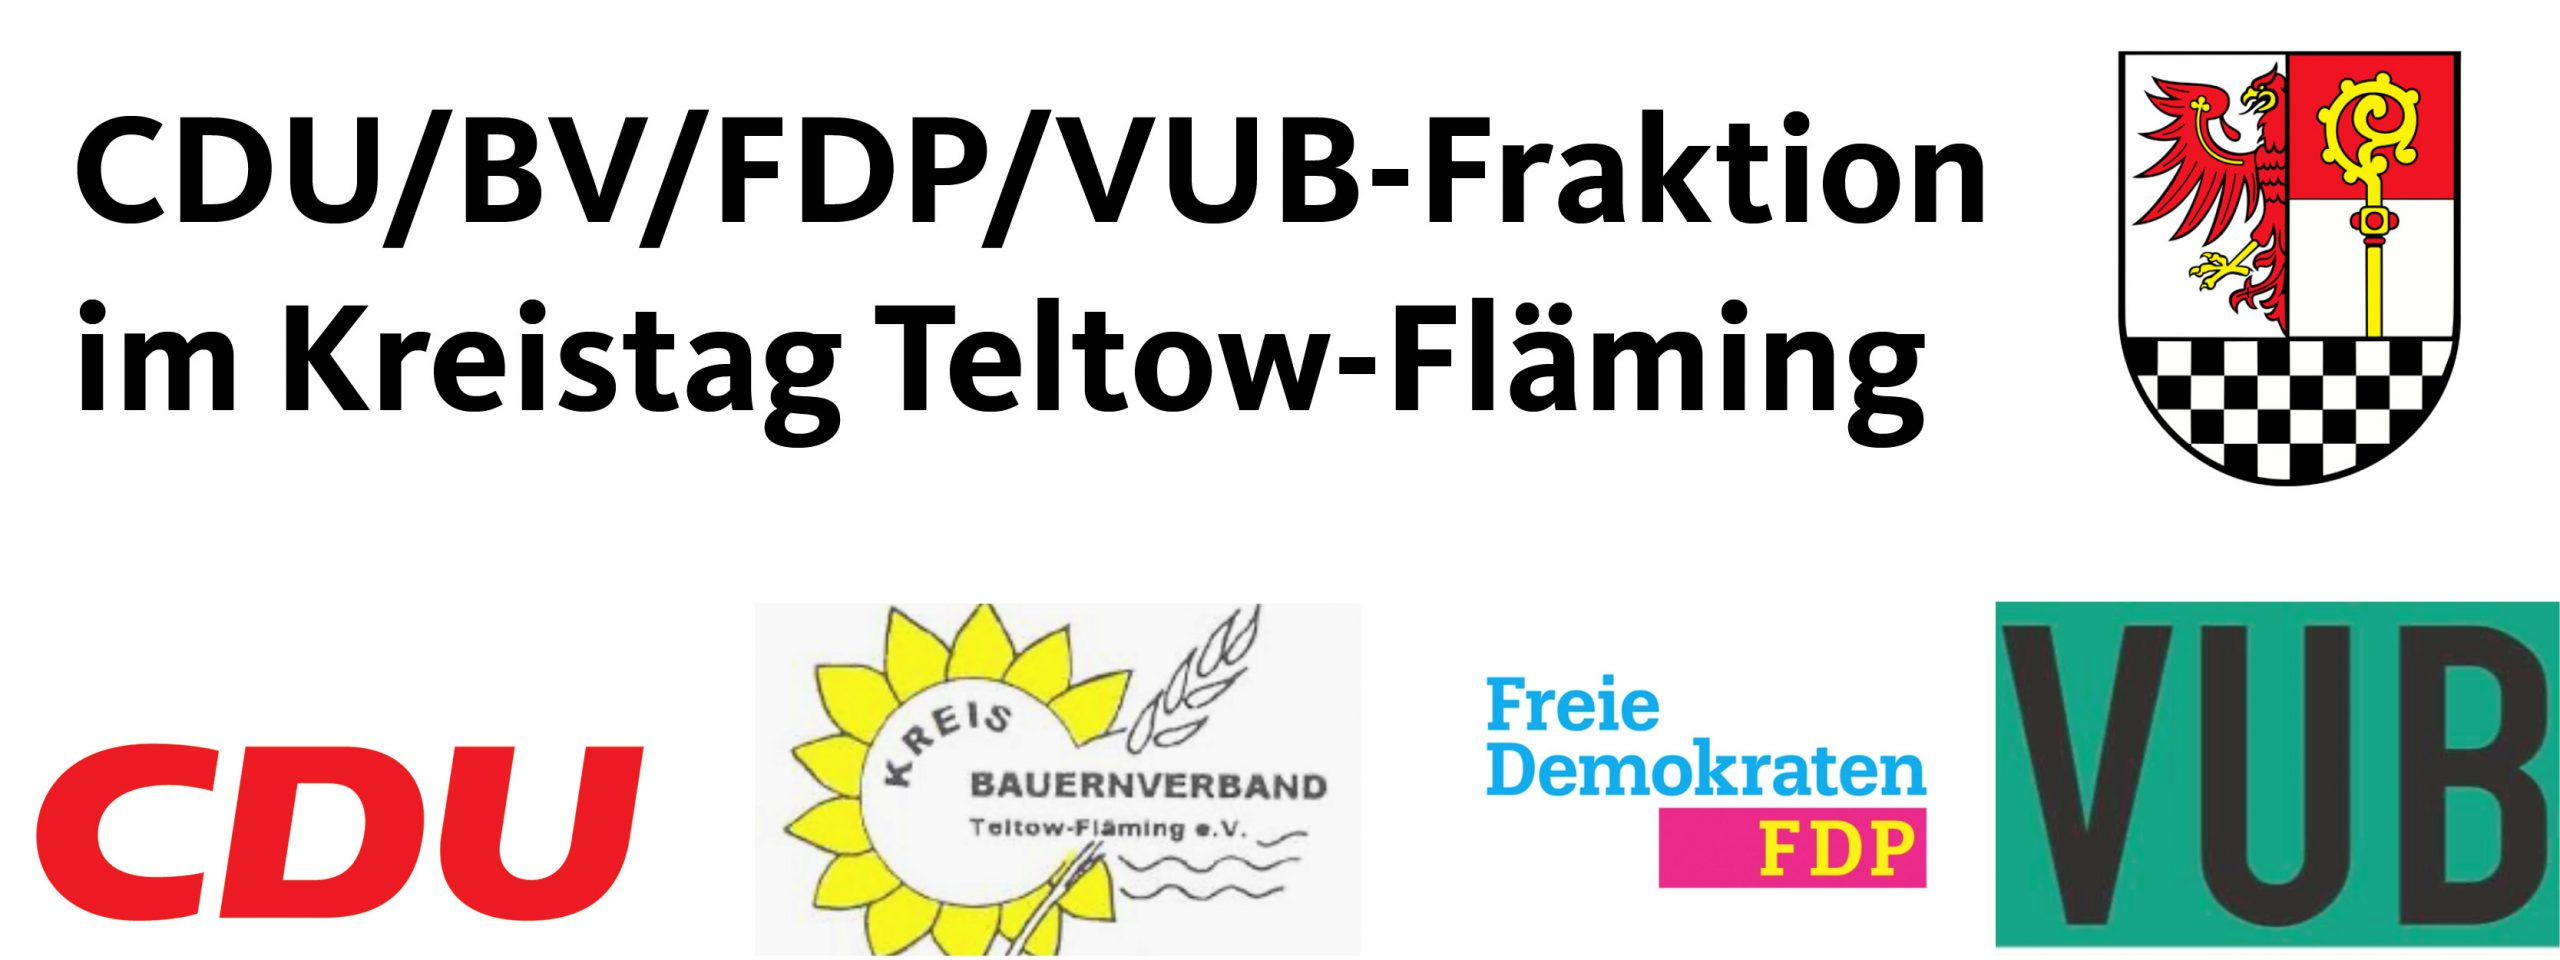 CDU/BV/FDP/VUB-Fraktion im Kreistag Teltow-Fläming